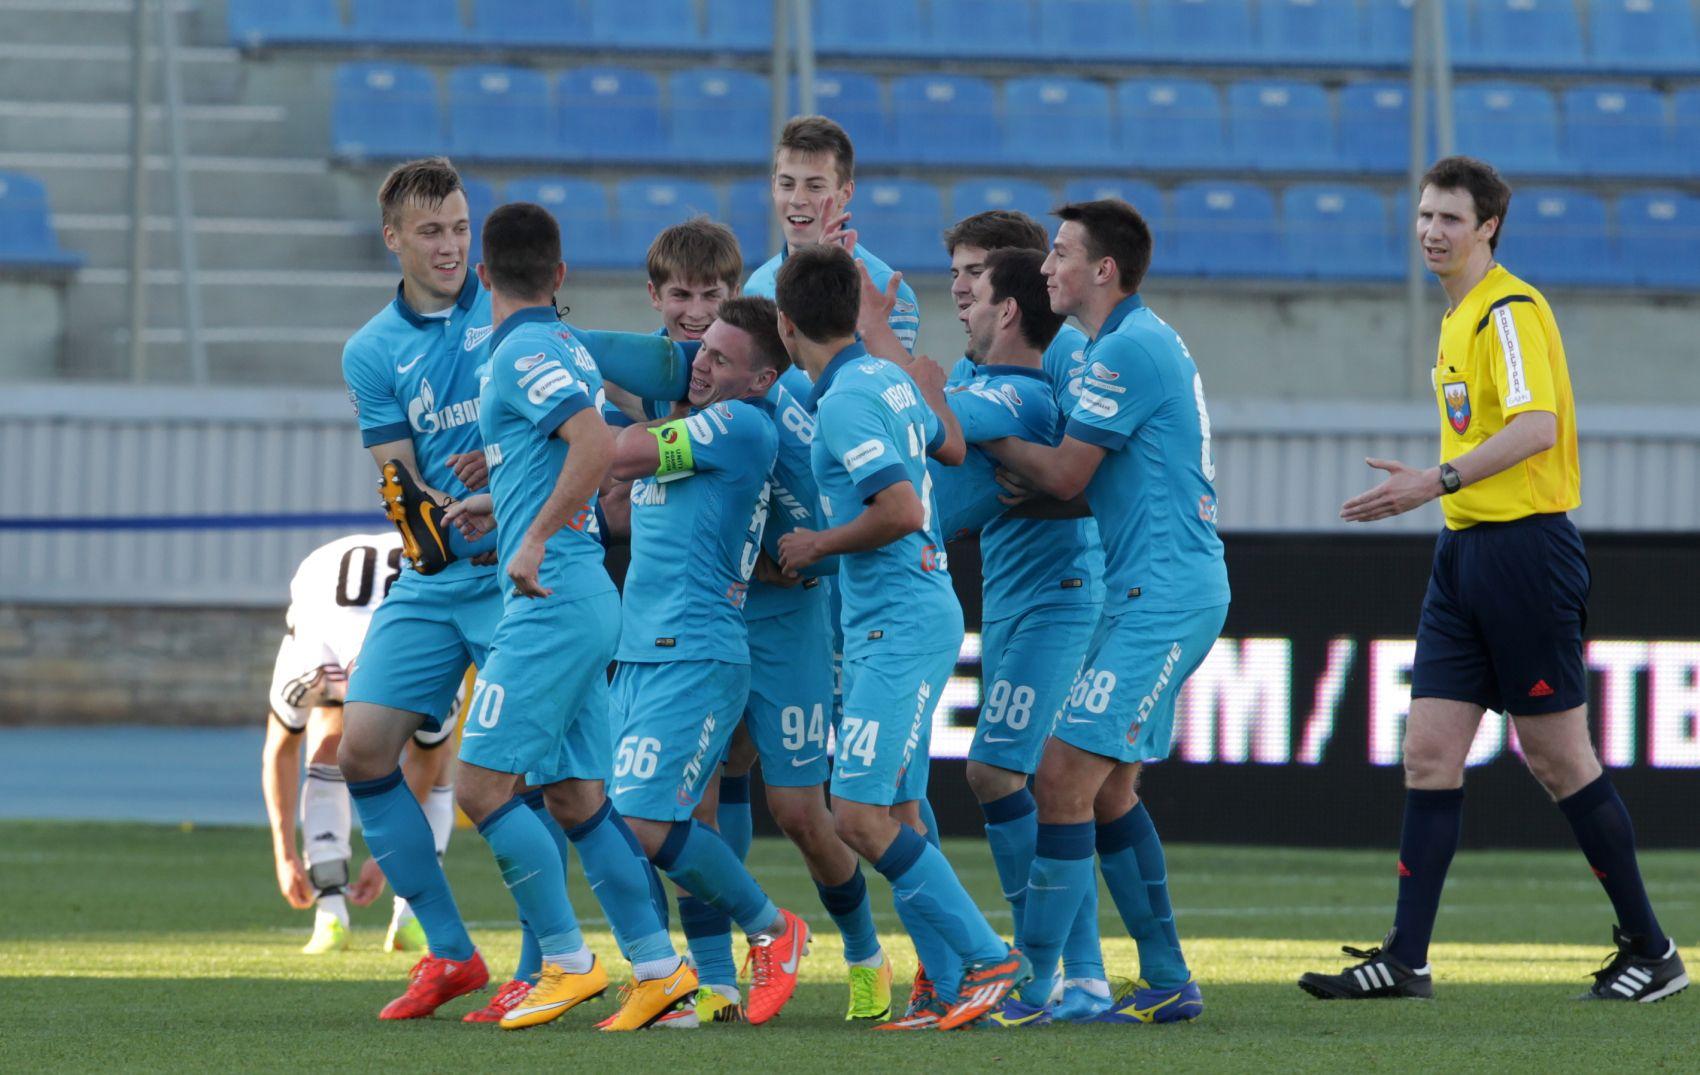 Zenit Izhevsk Vs Neftekhimik Live Football Stream Russian Cup 07 Aug Adsbygoogle Window Adsbygoo Football Streaming Live Football Streaming Football